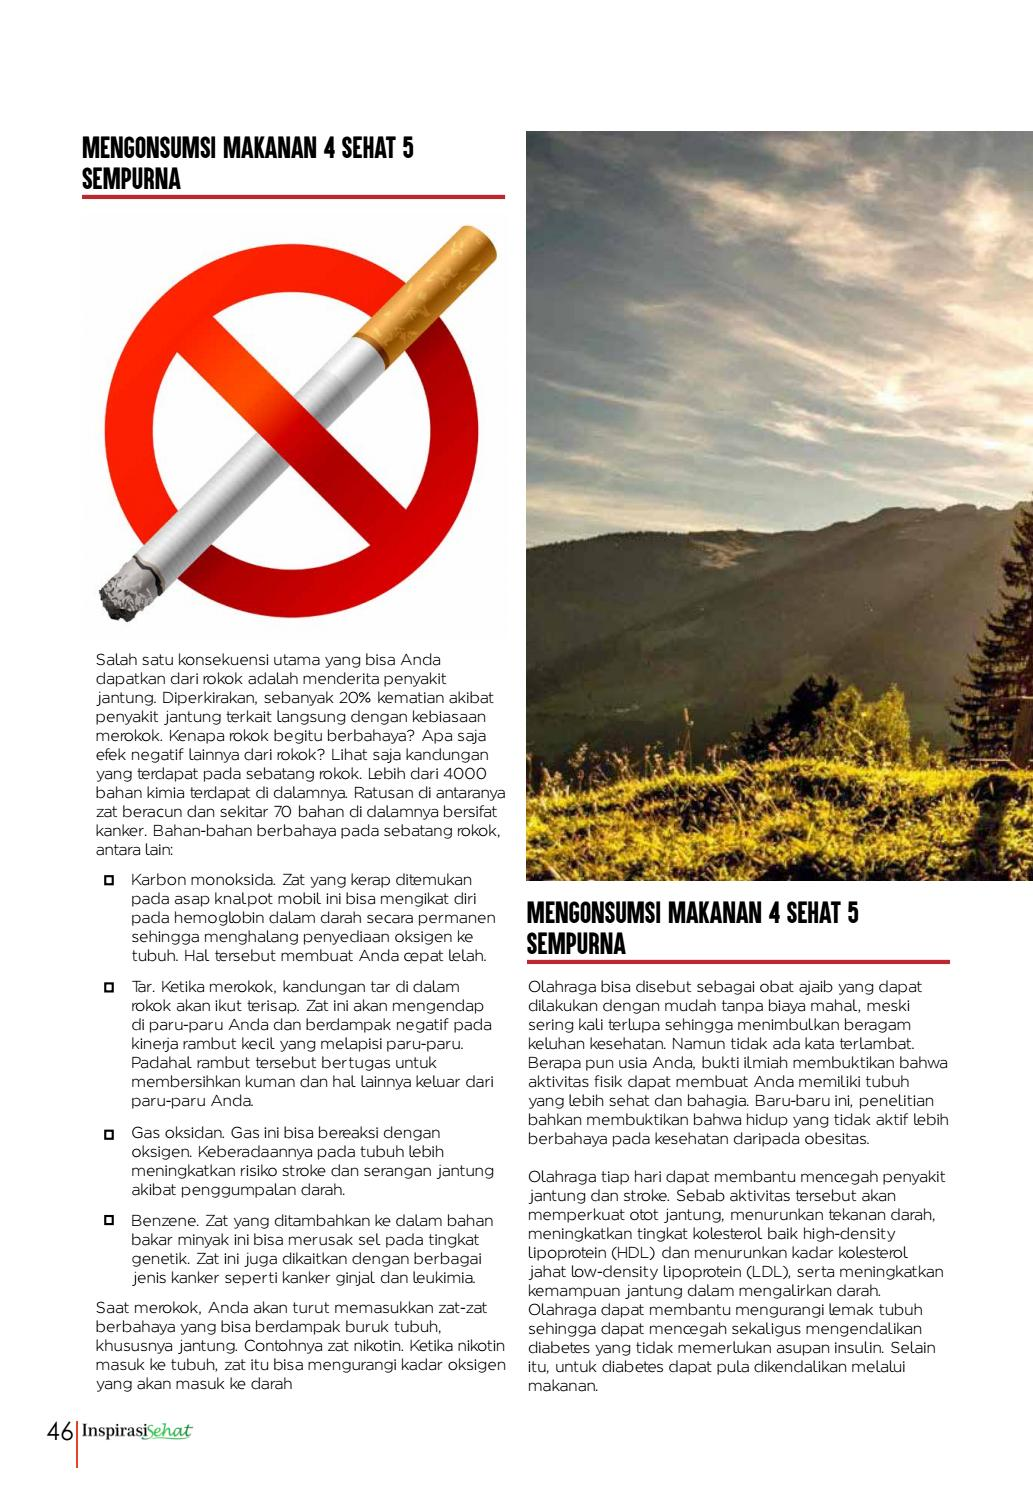 Nikotin Merupakan Zat Berbahaya Yang Dapat Ditemukan Pada : nikotin, merupakan, berbahaya, dapat, ditemukan, Majalah, Inspirasi, Sehat, Edisi, Agustus, September, Issuu